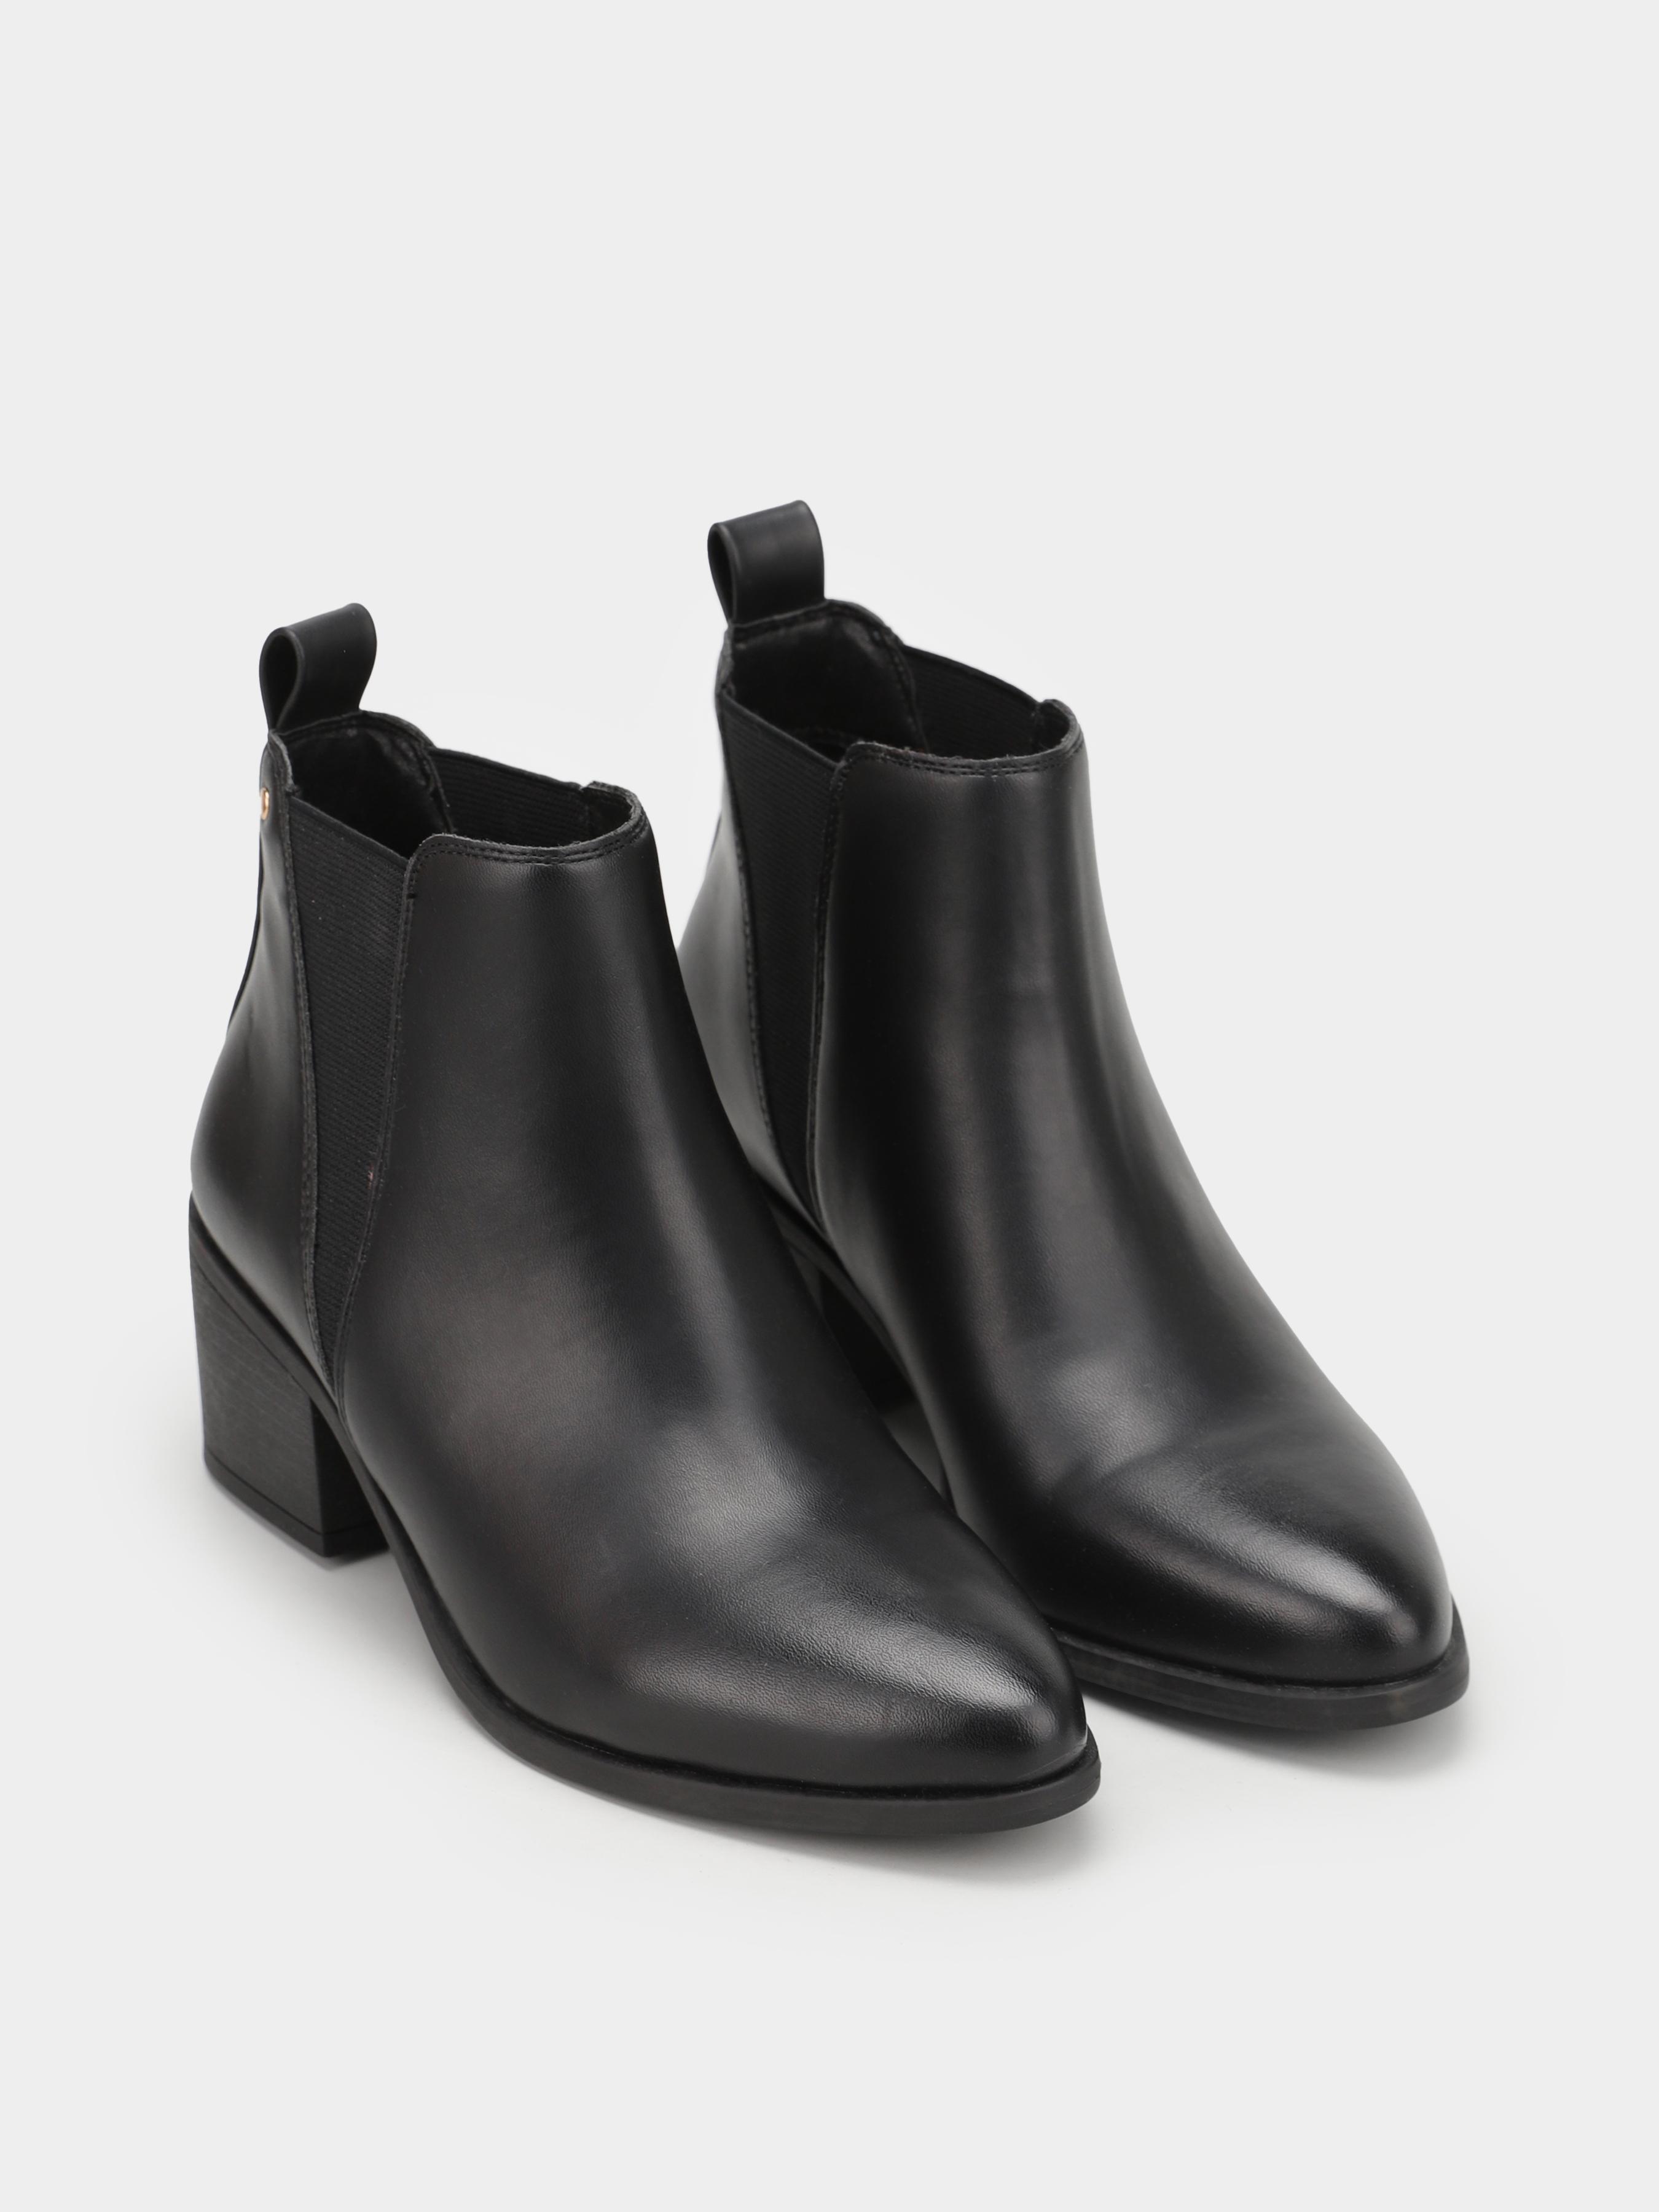 Ботинки для женщин M Wone OI134 размерная сетка обуви, 2017